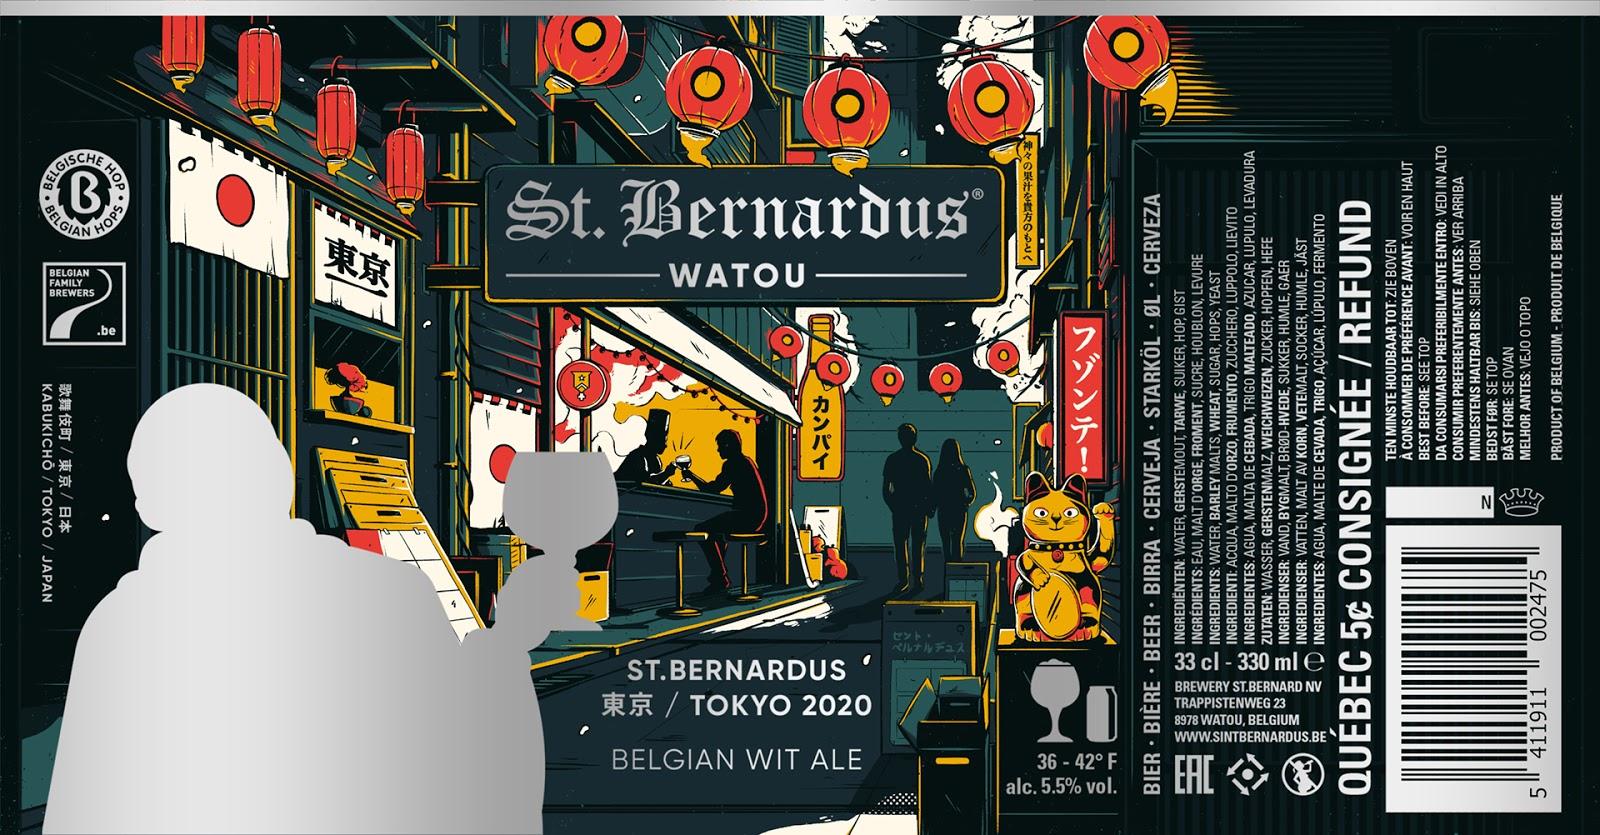 St Bernardus Tokyo 2020 label